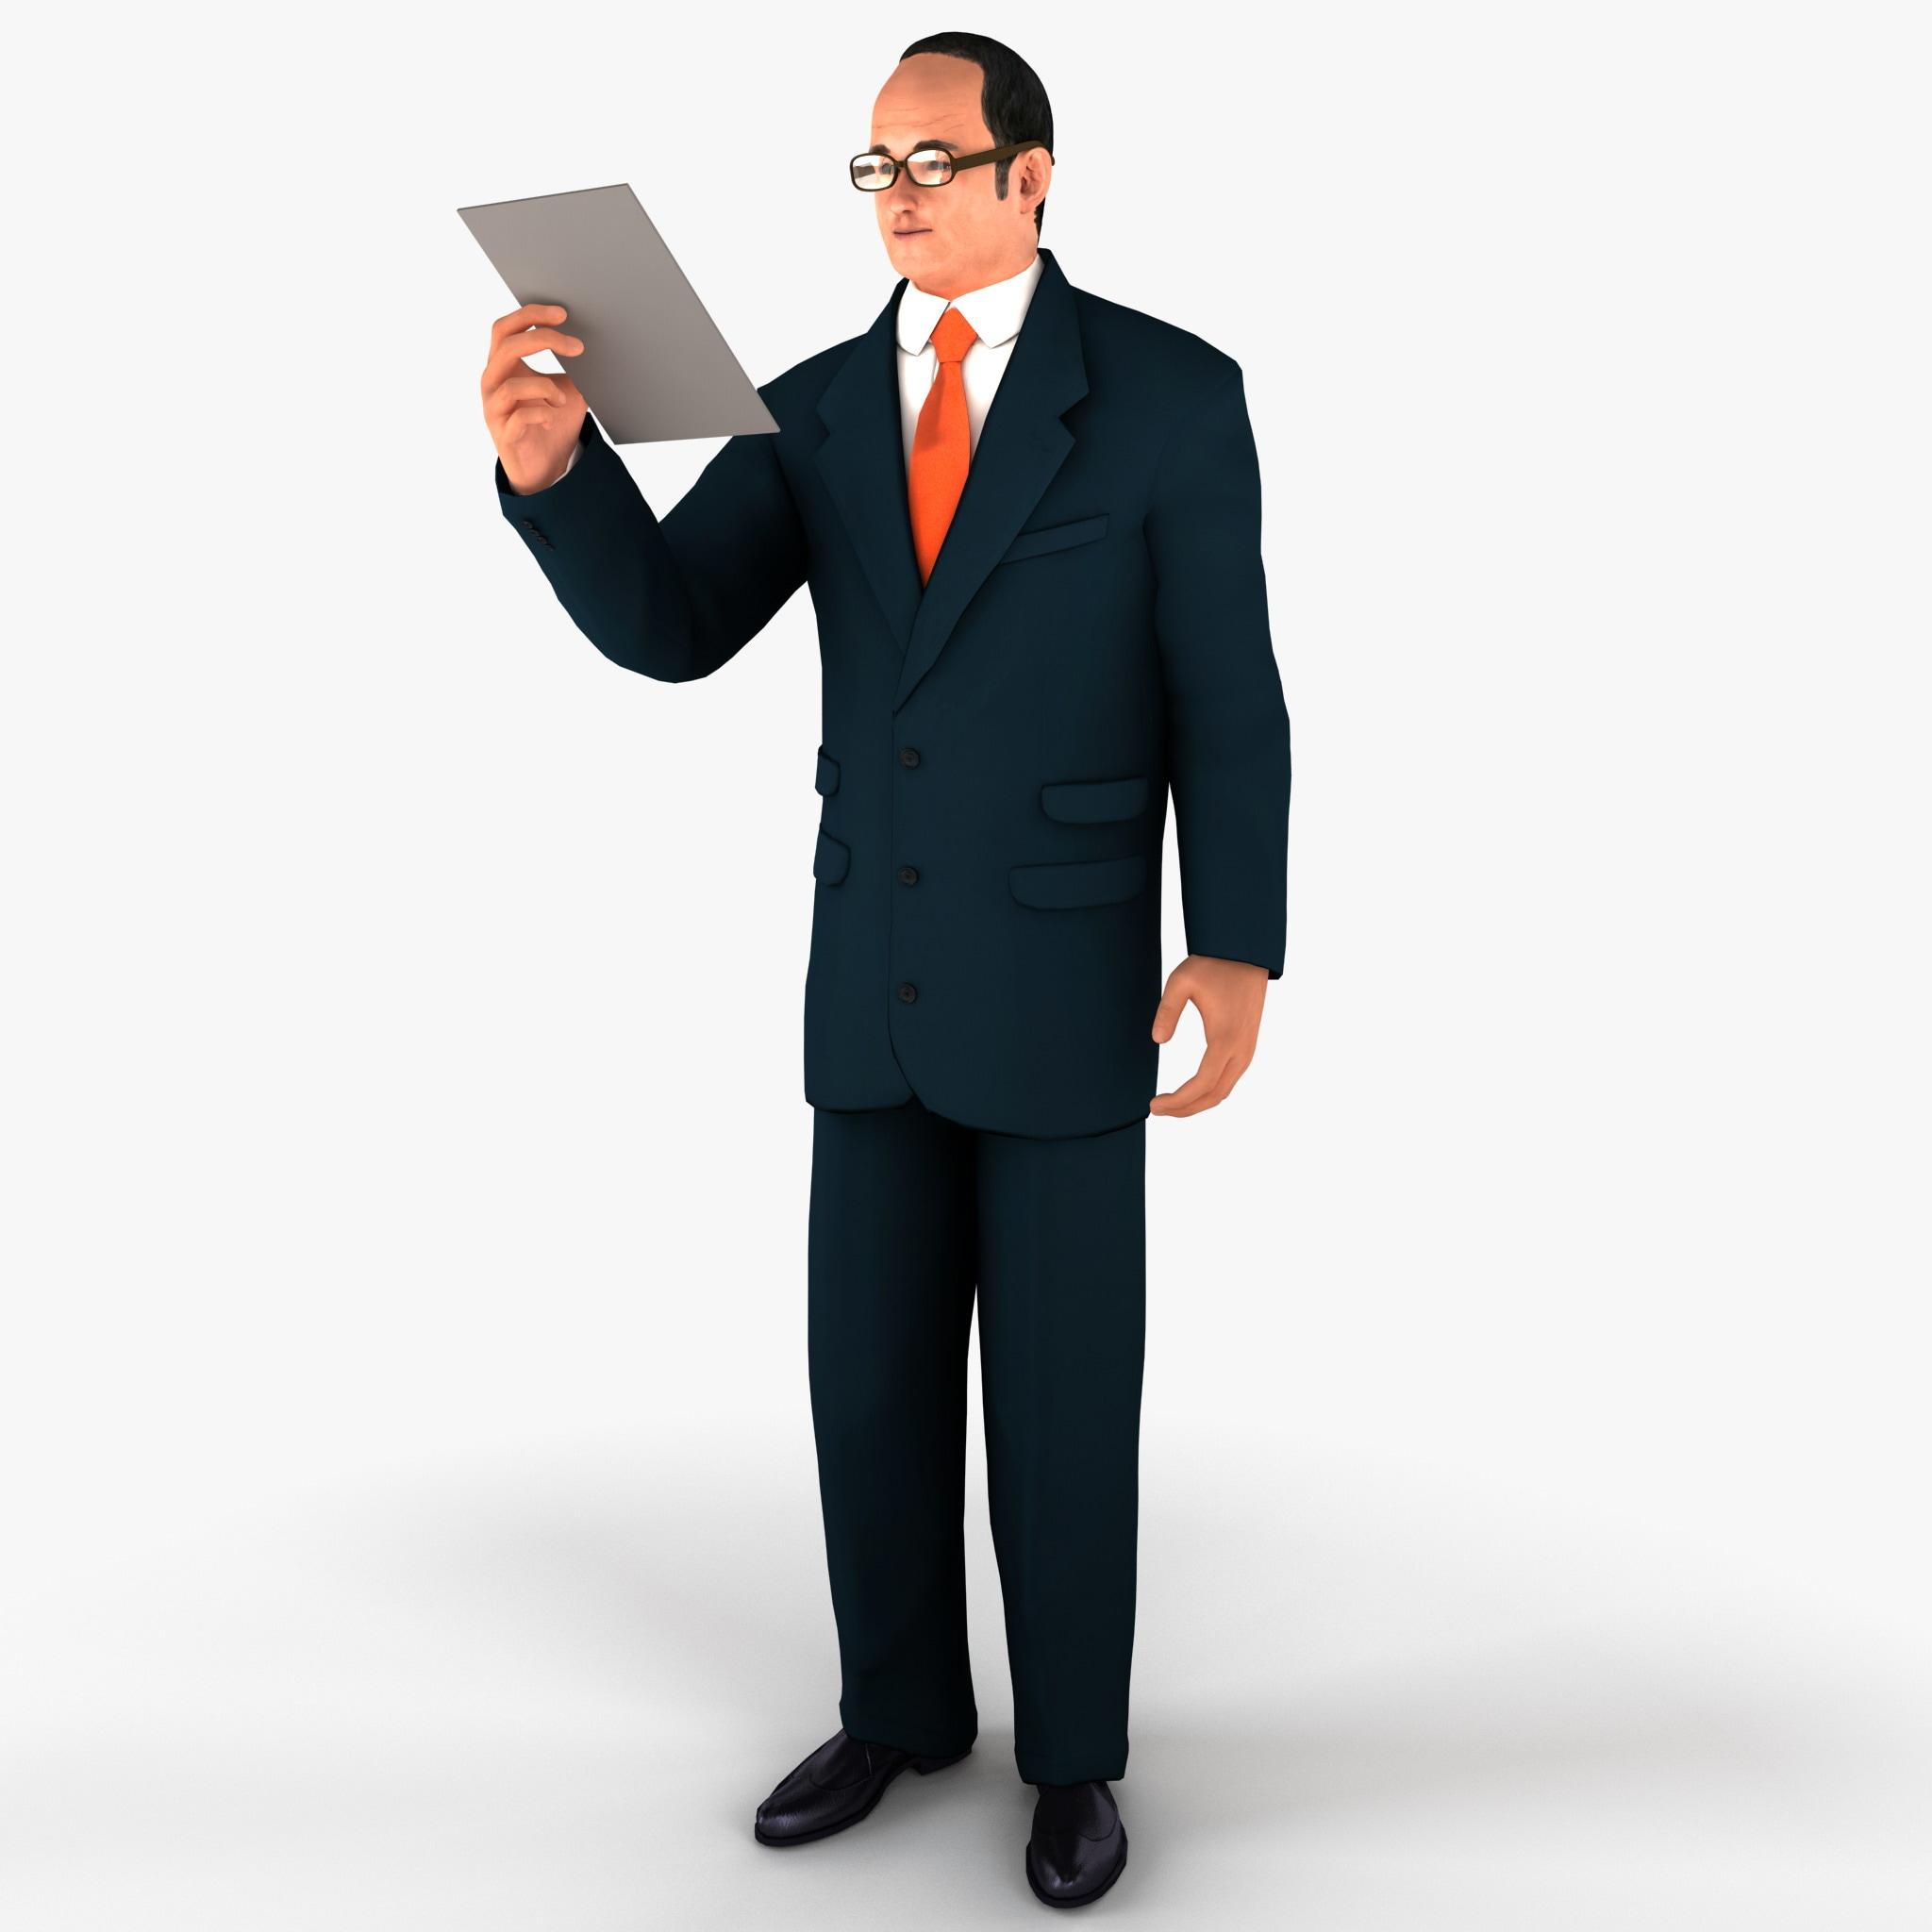 Businessman 2 Pose 3_2.jpg